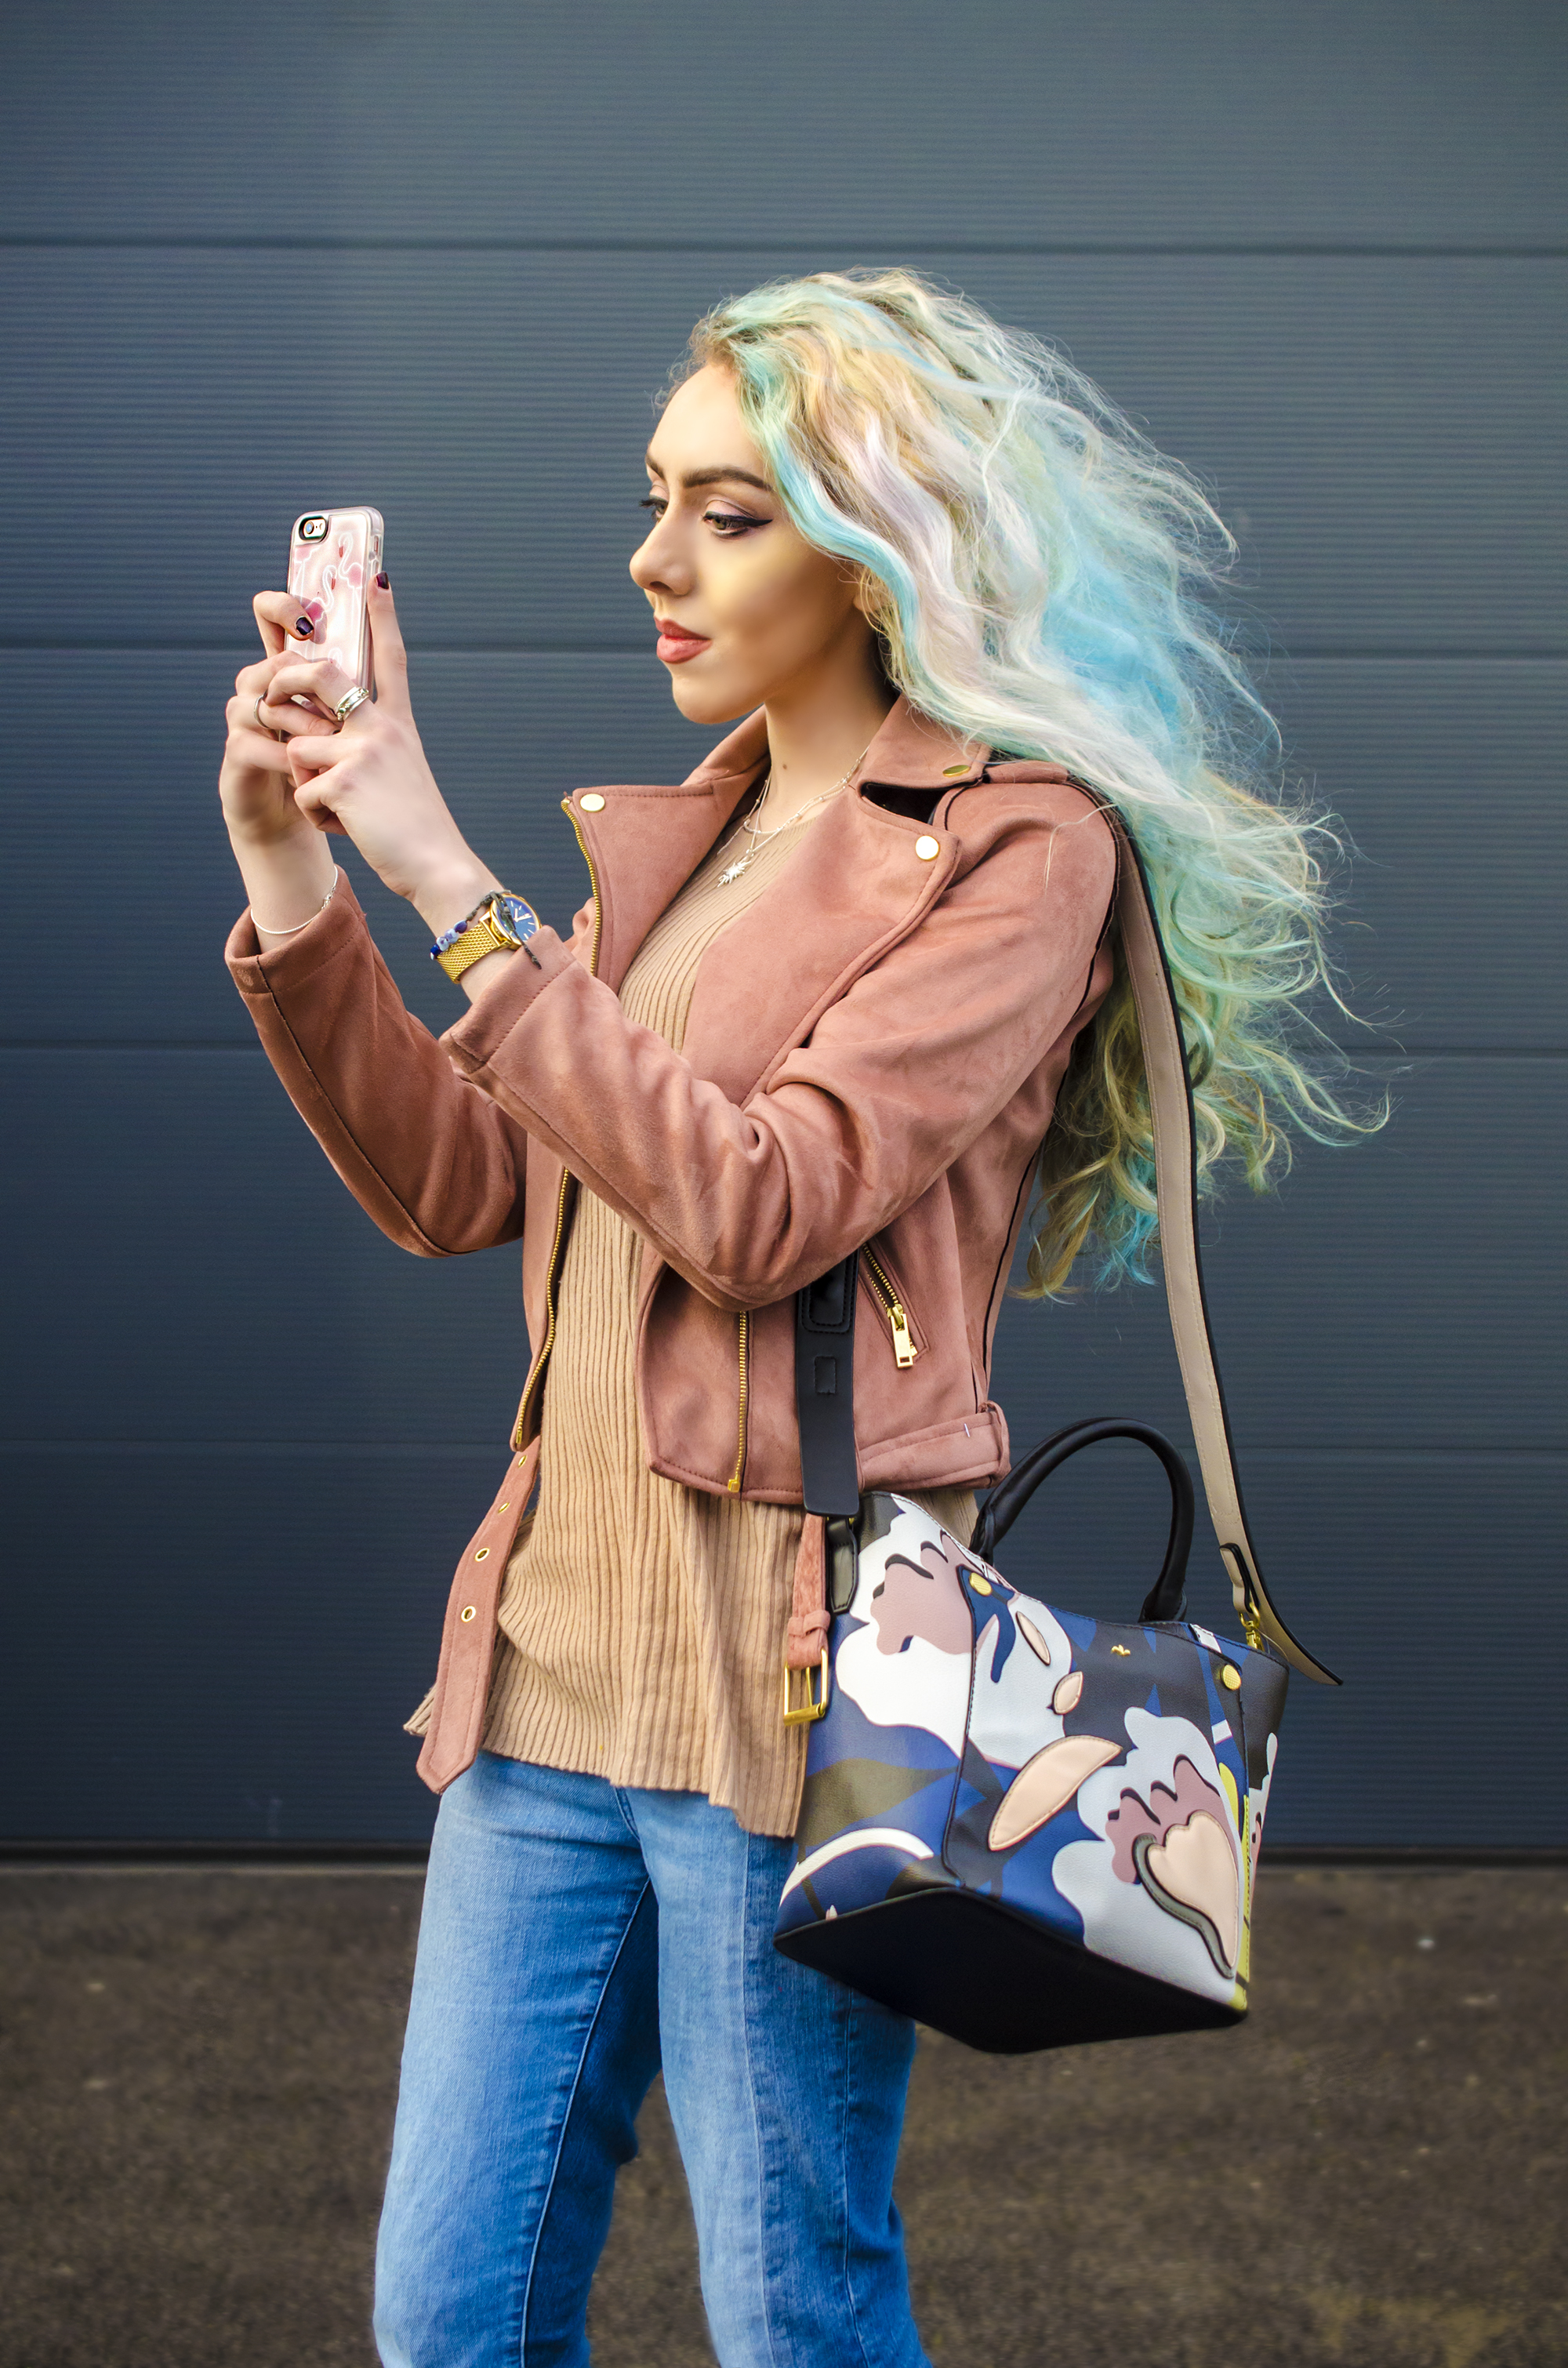 Stephi LaReine Rainbow Hair Selfie